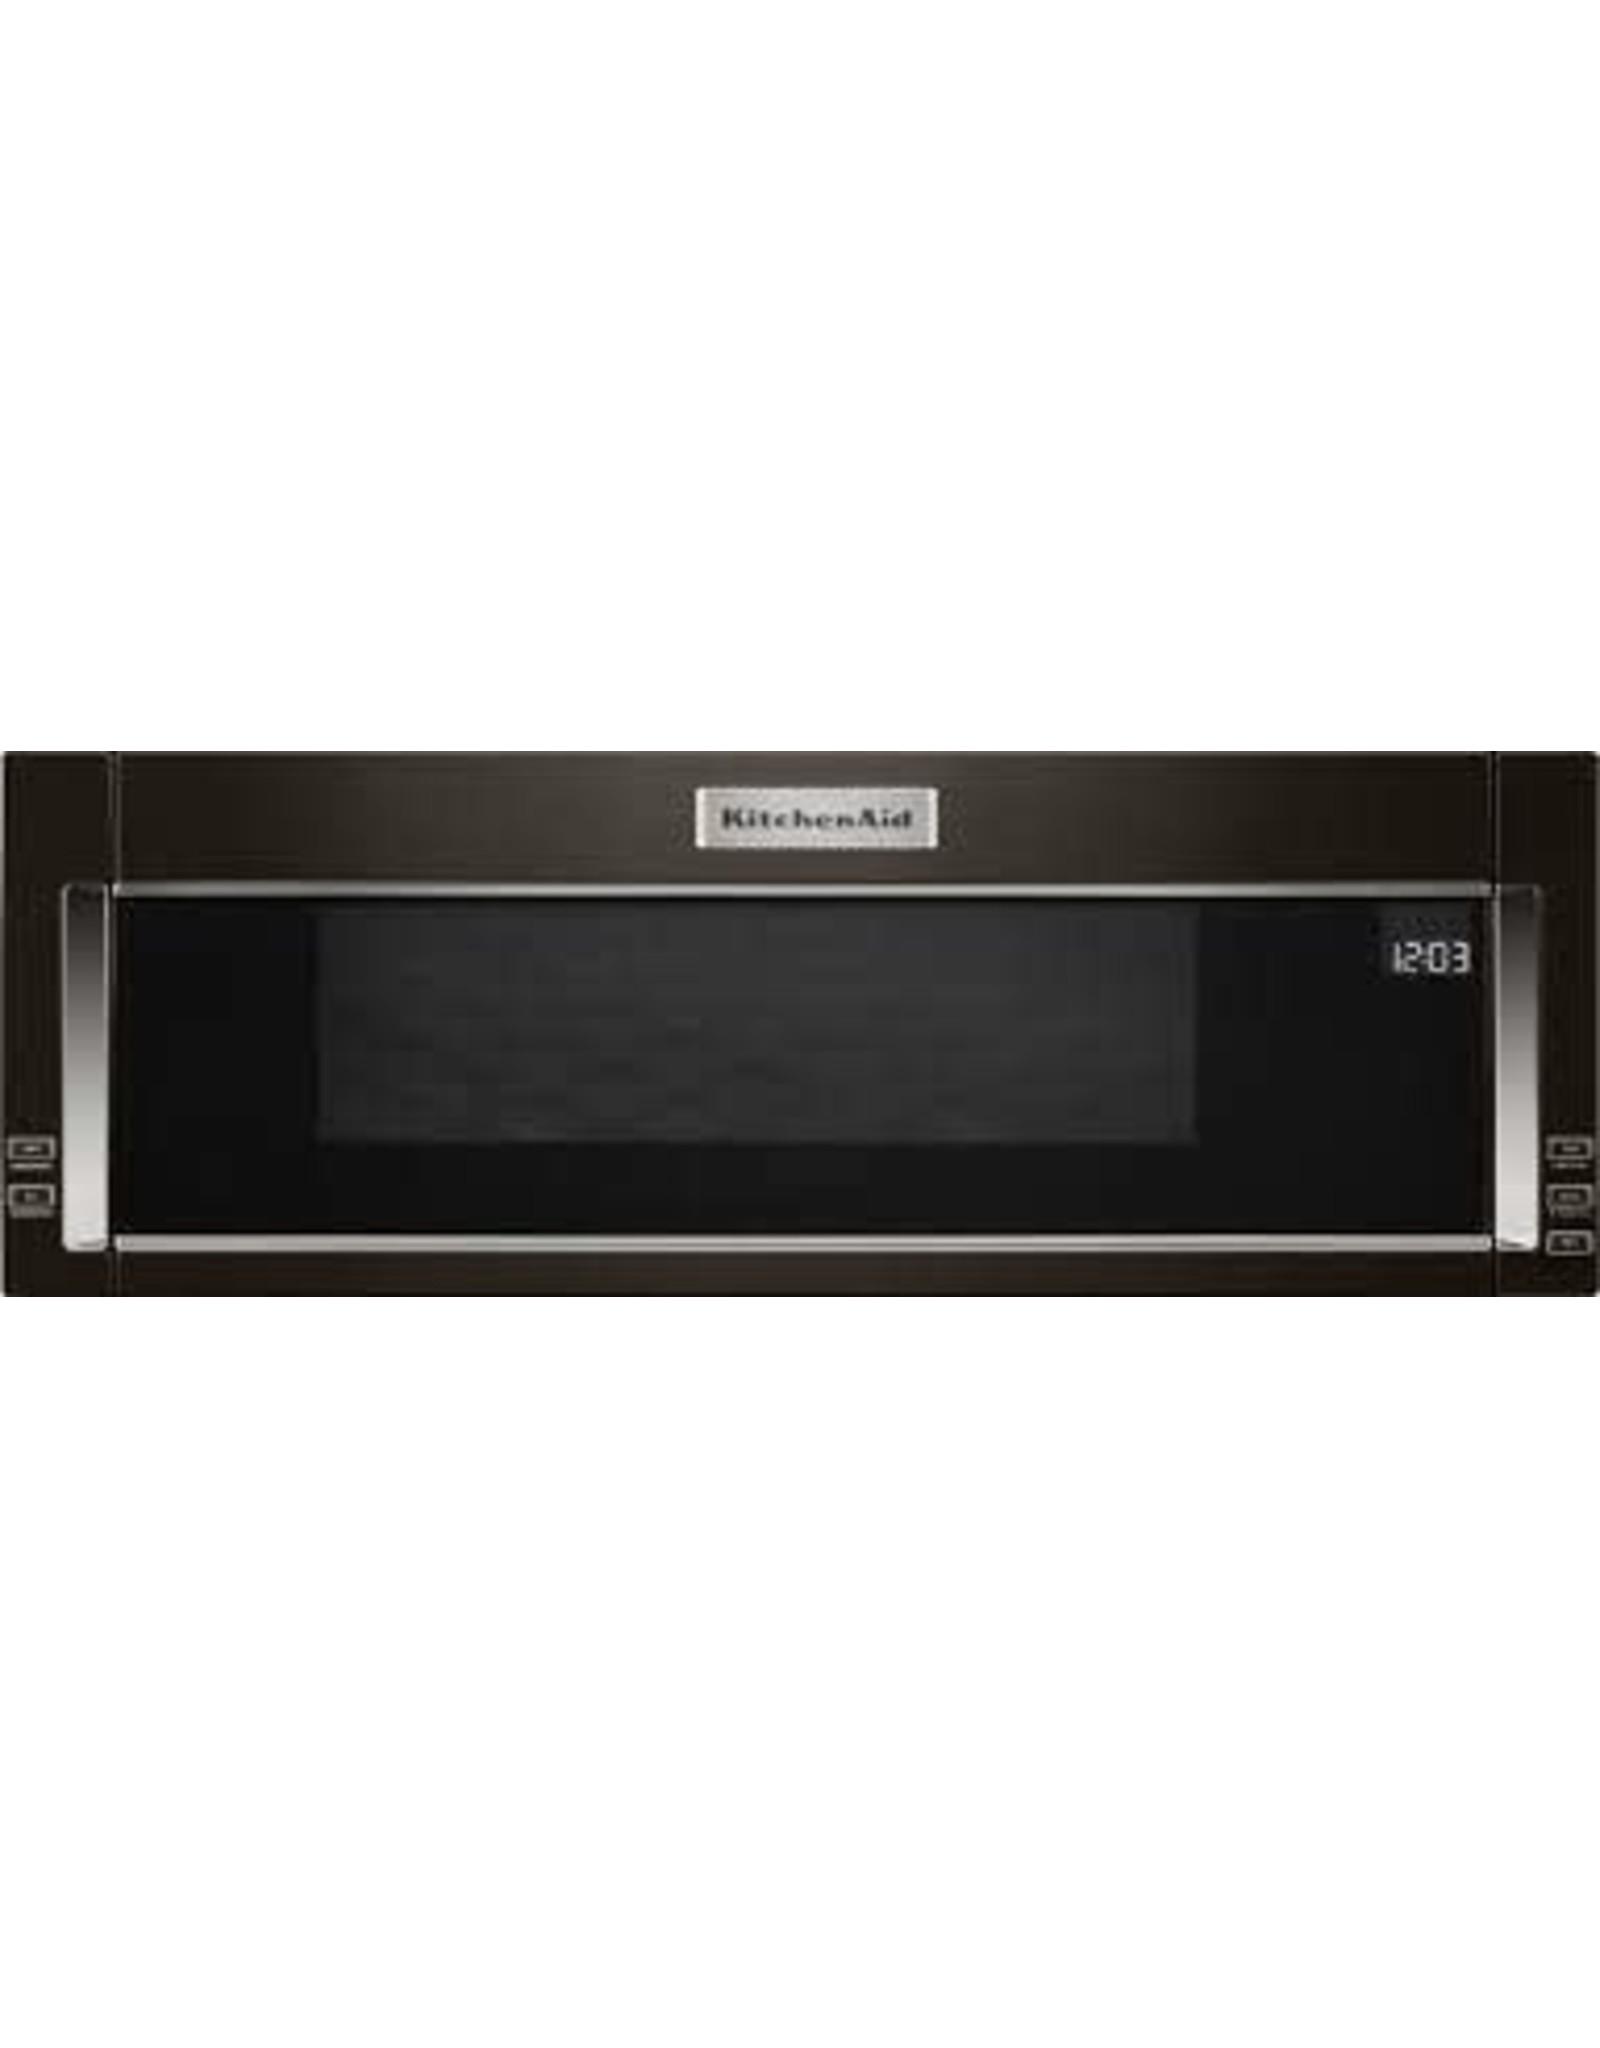 KMLS311HBS KAD Microwave, Hood, Combination - LOW-PROFILE MHC